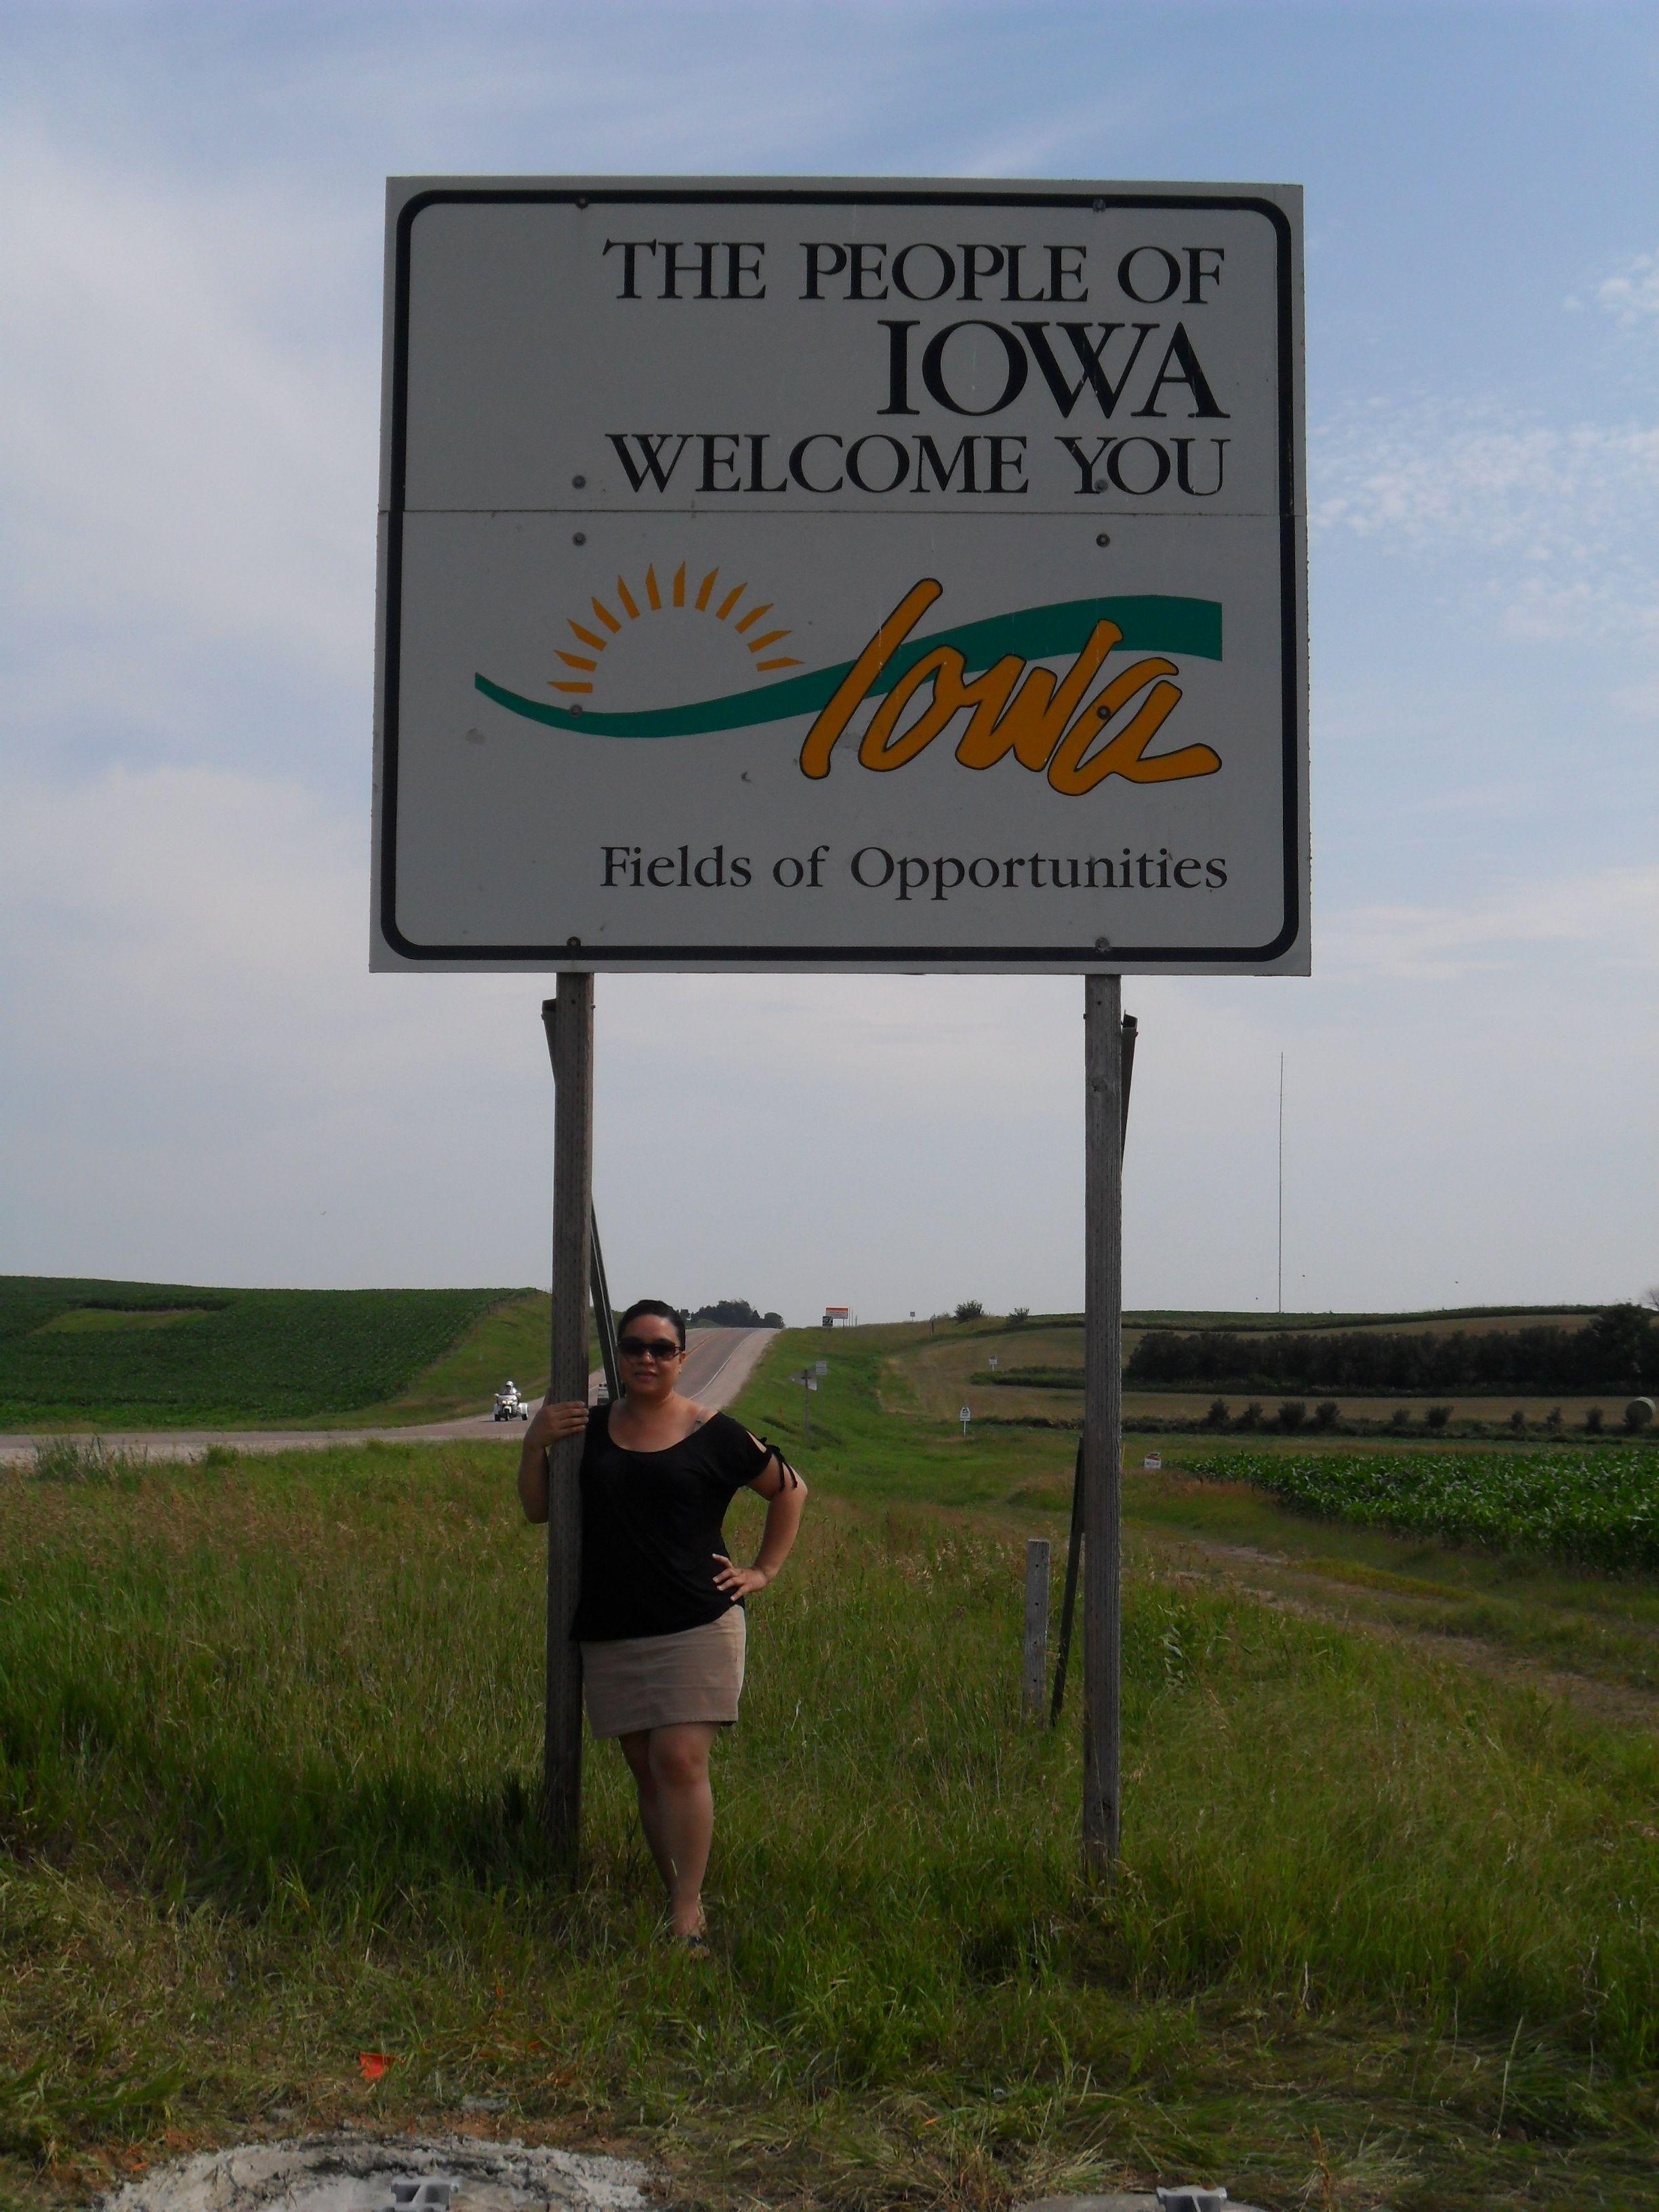 Coraville ia iowa states in america adventure